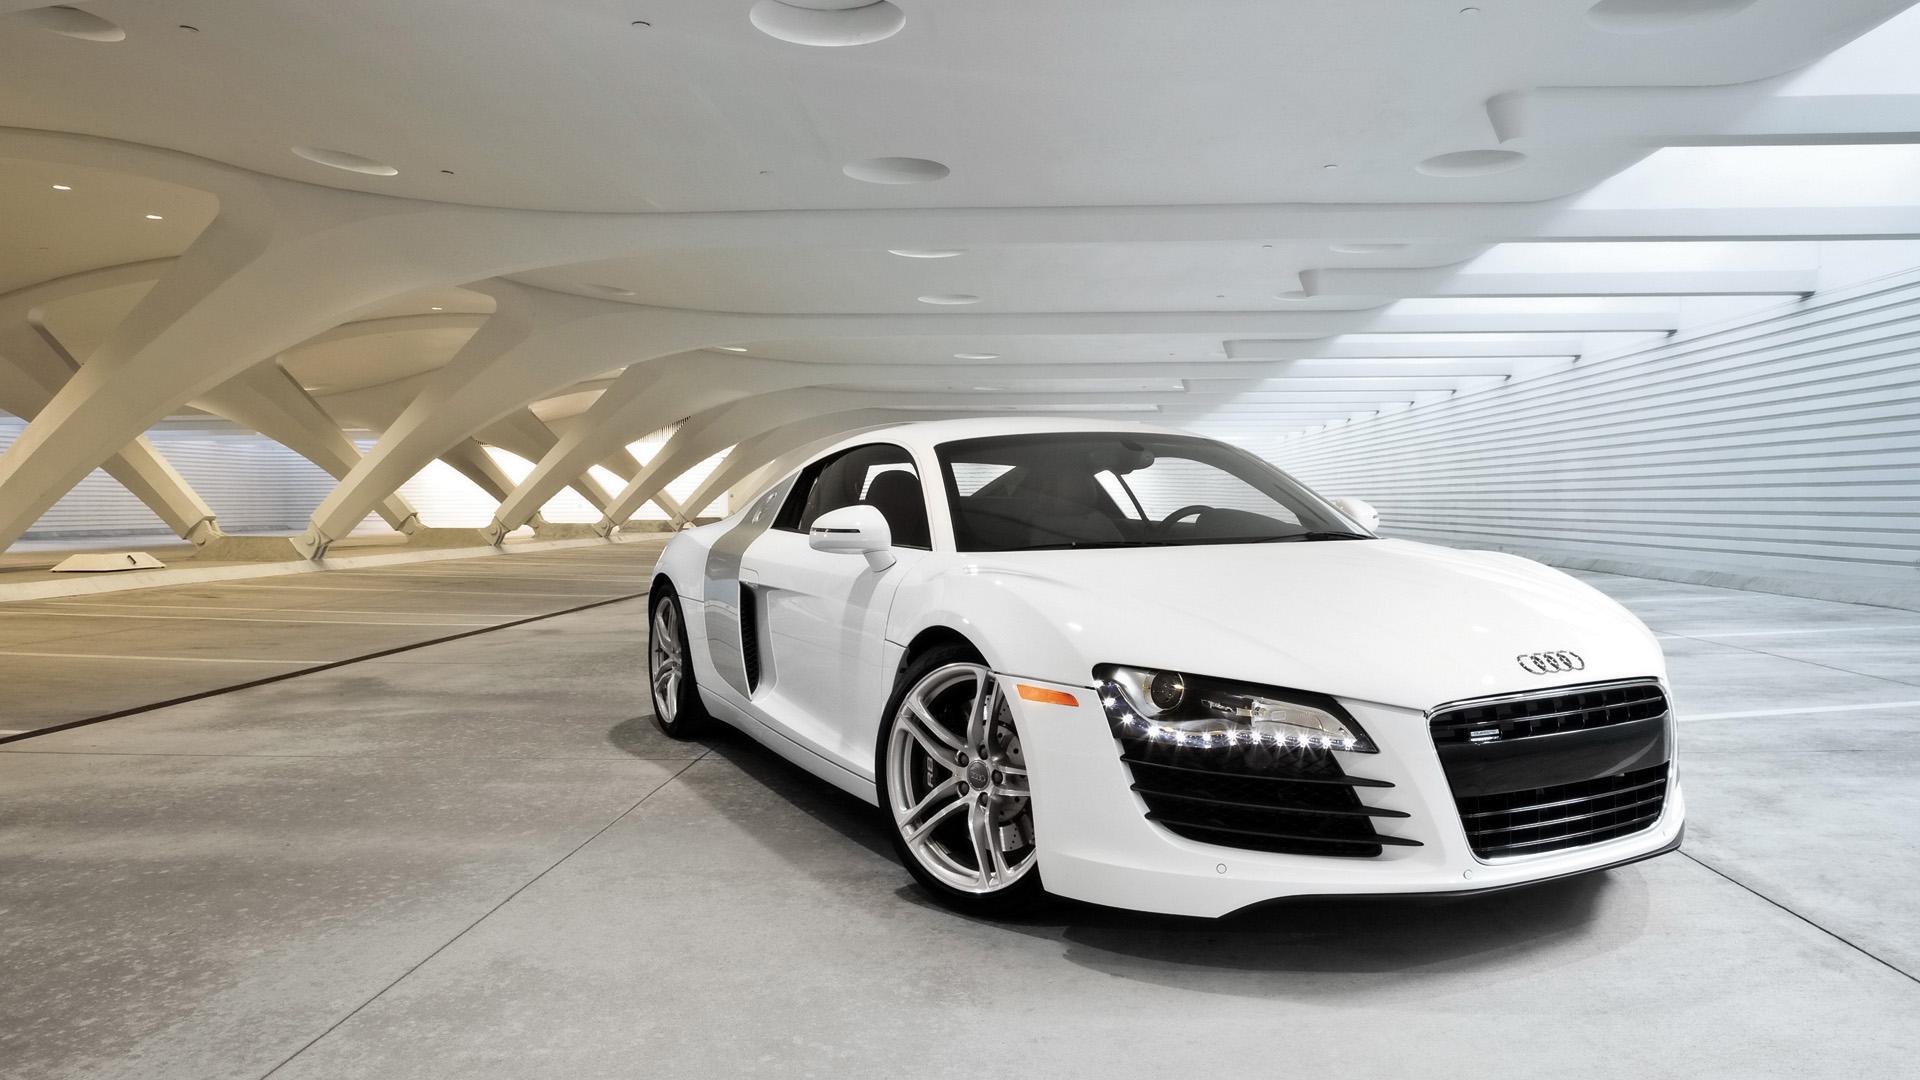 White Audi R8   1920x1080   169 1920x1080